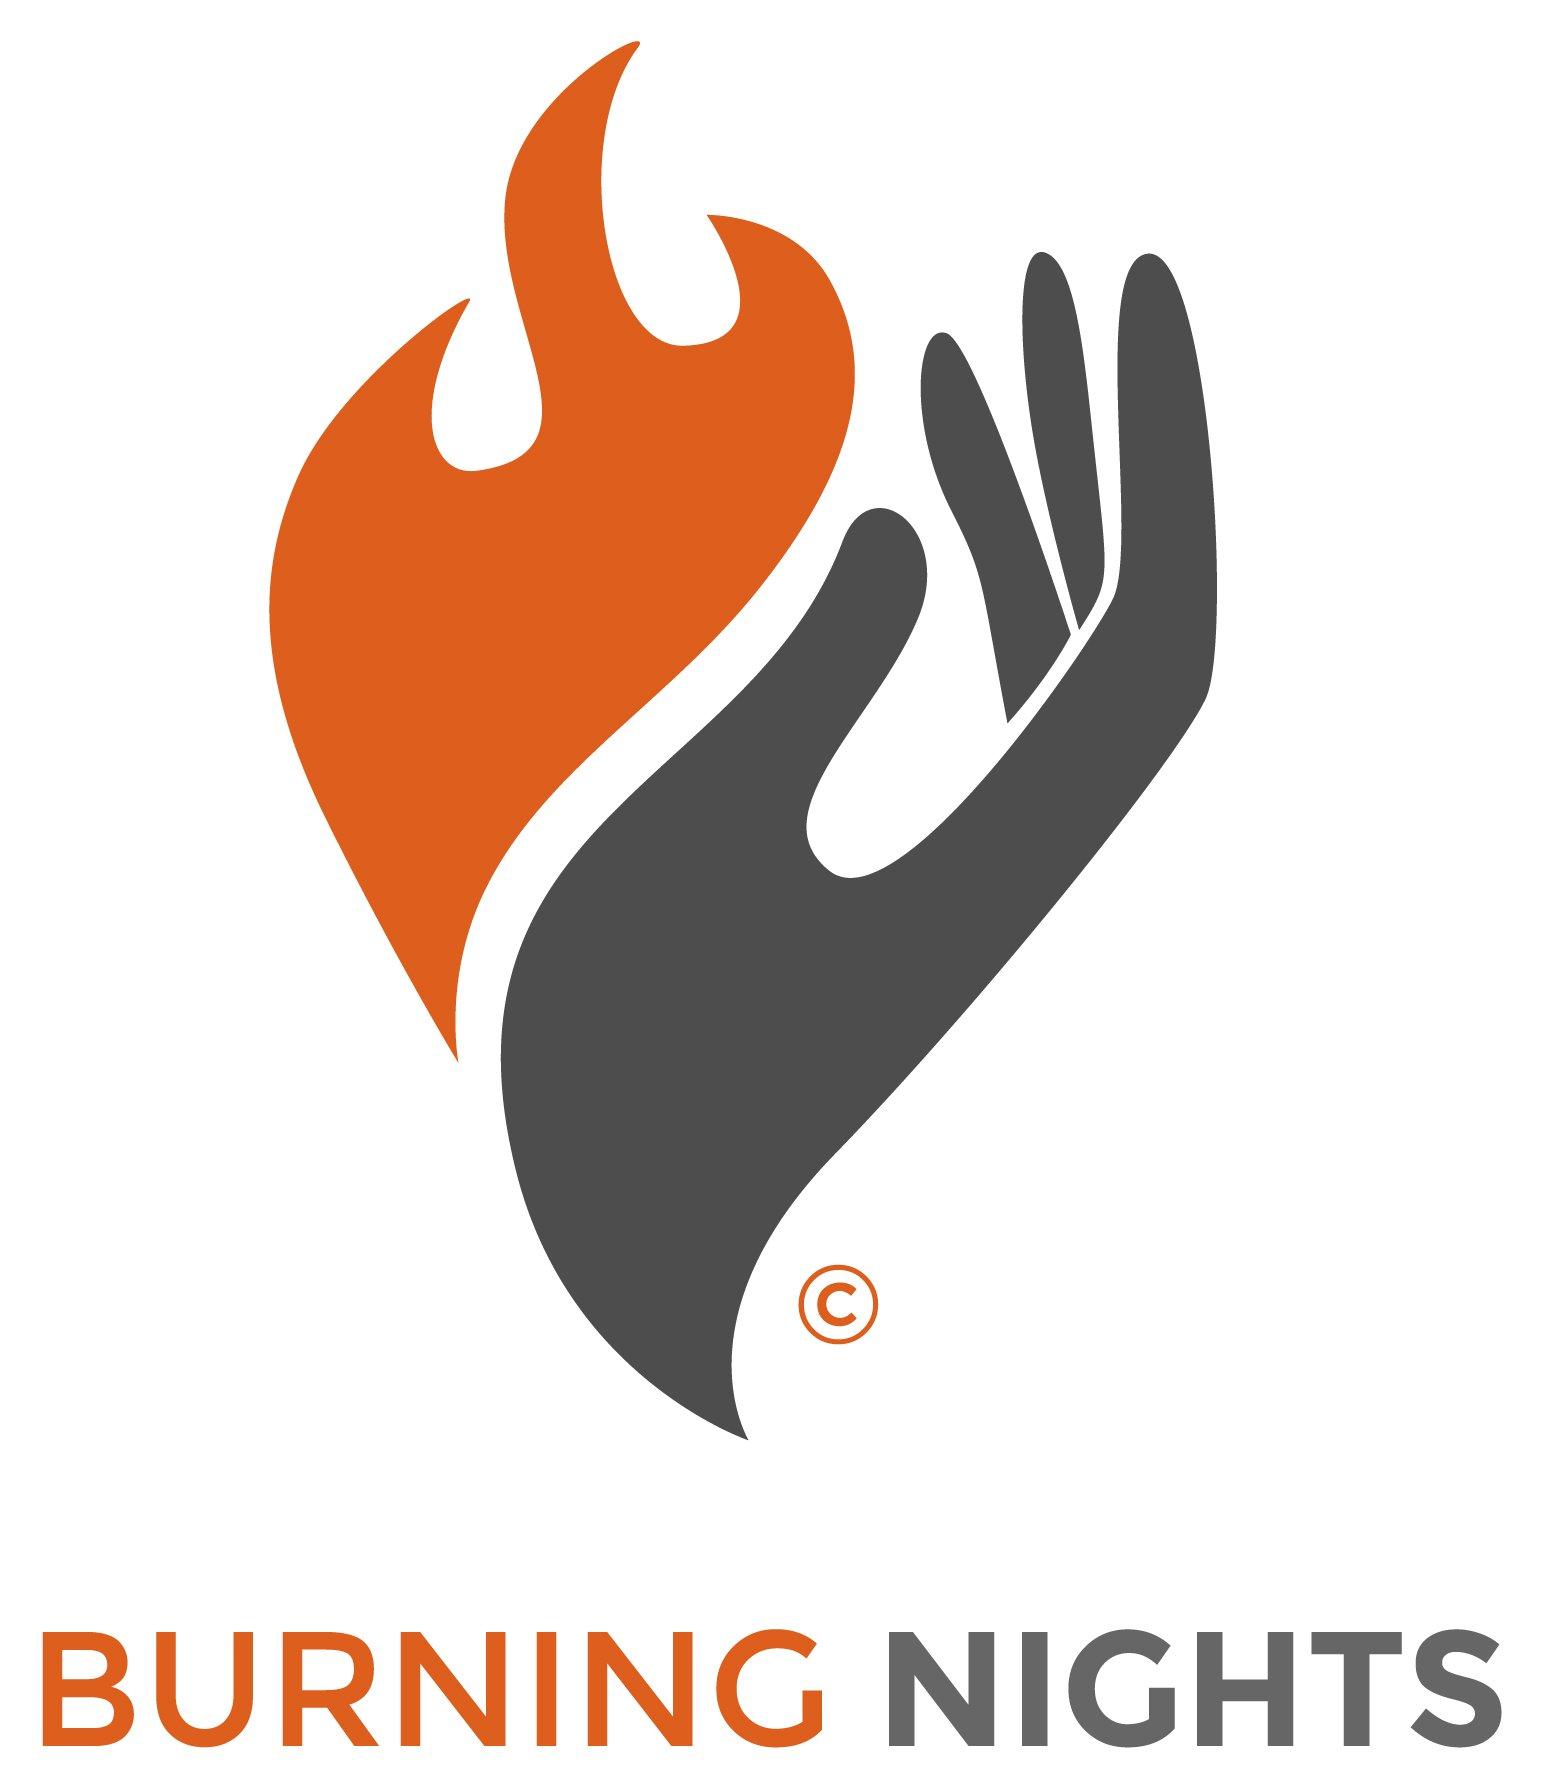 Burning-Nights-Orange-Logo-01